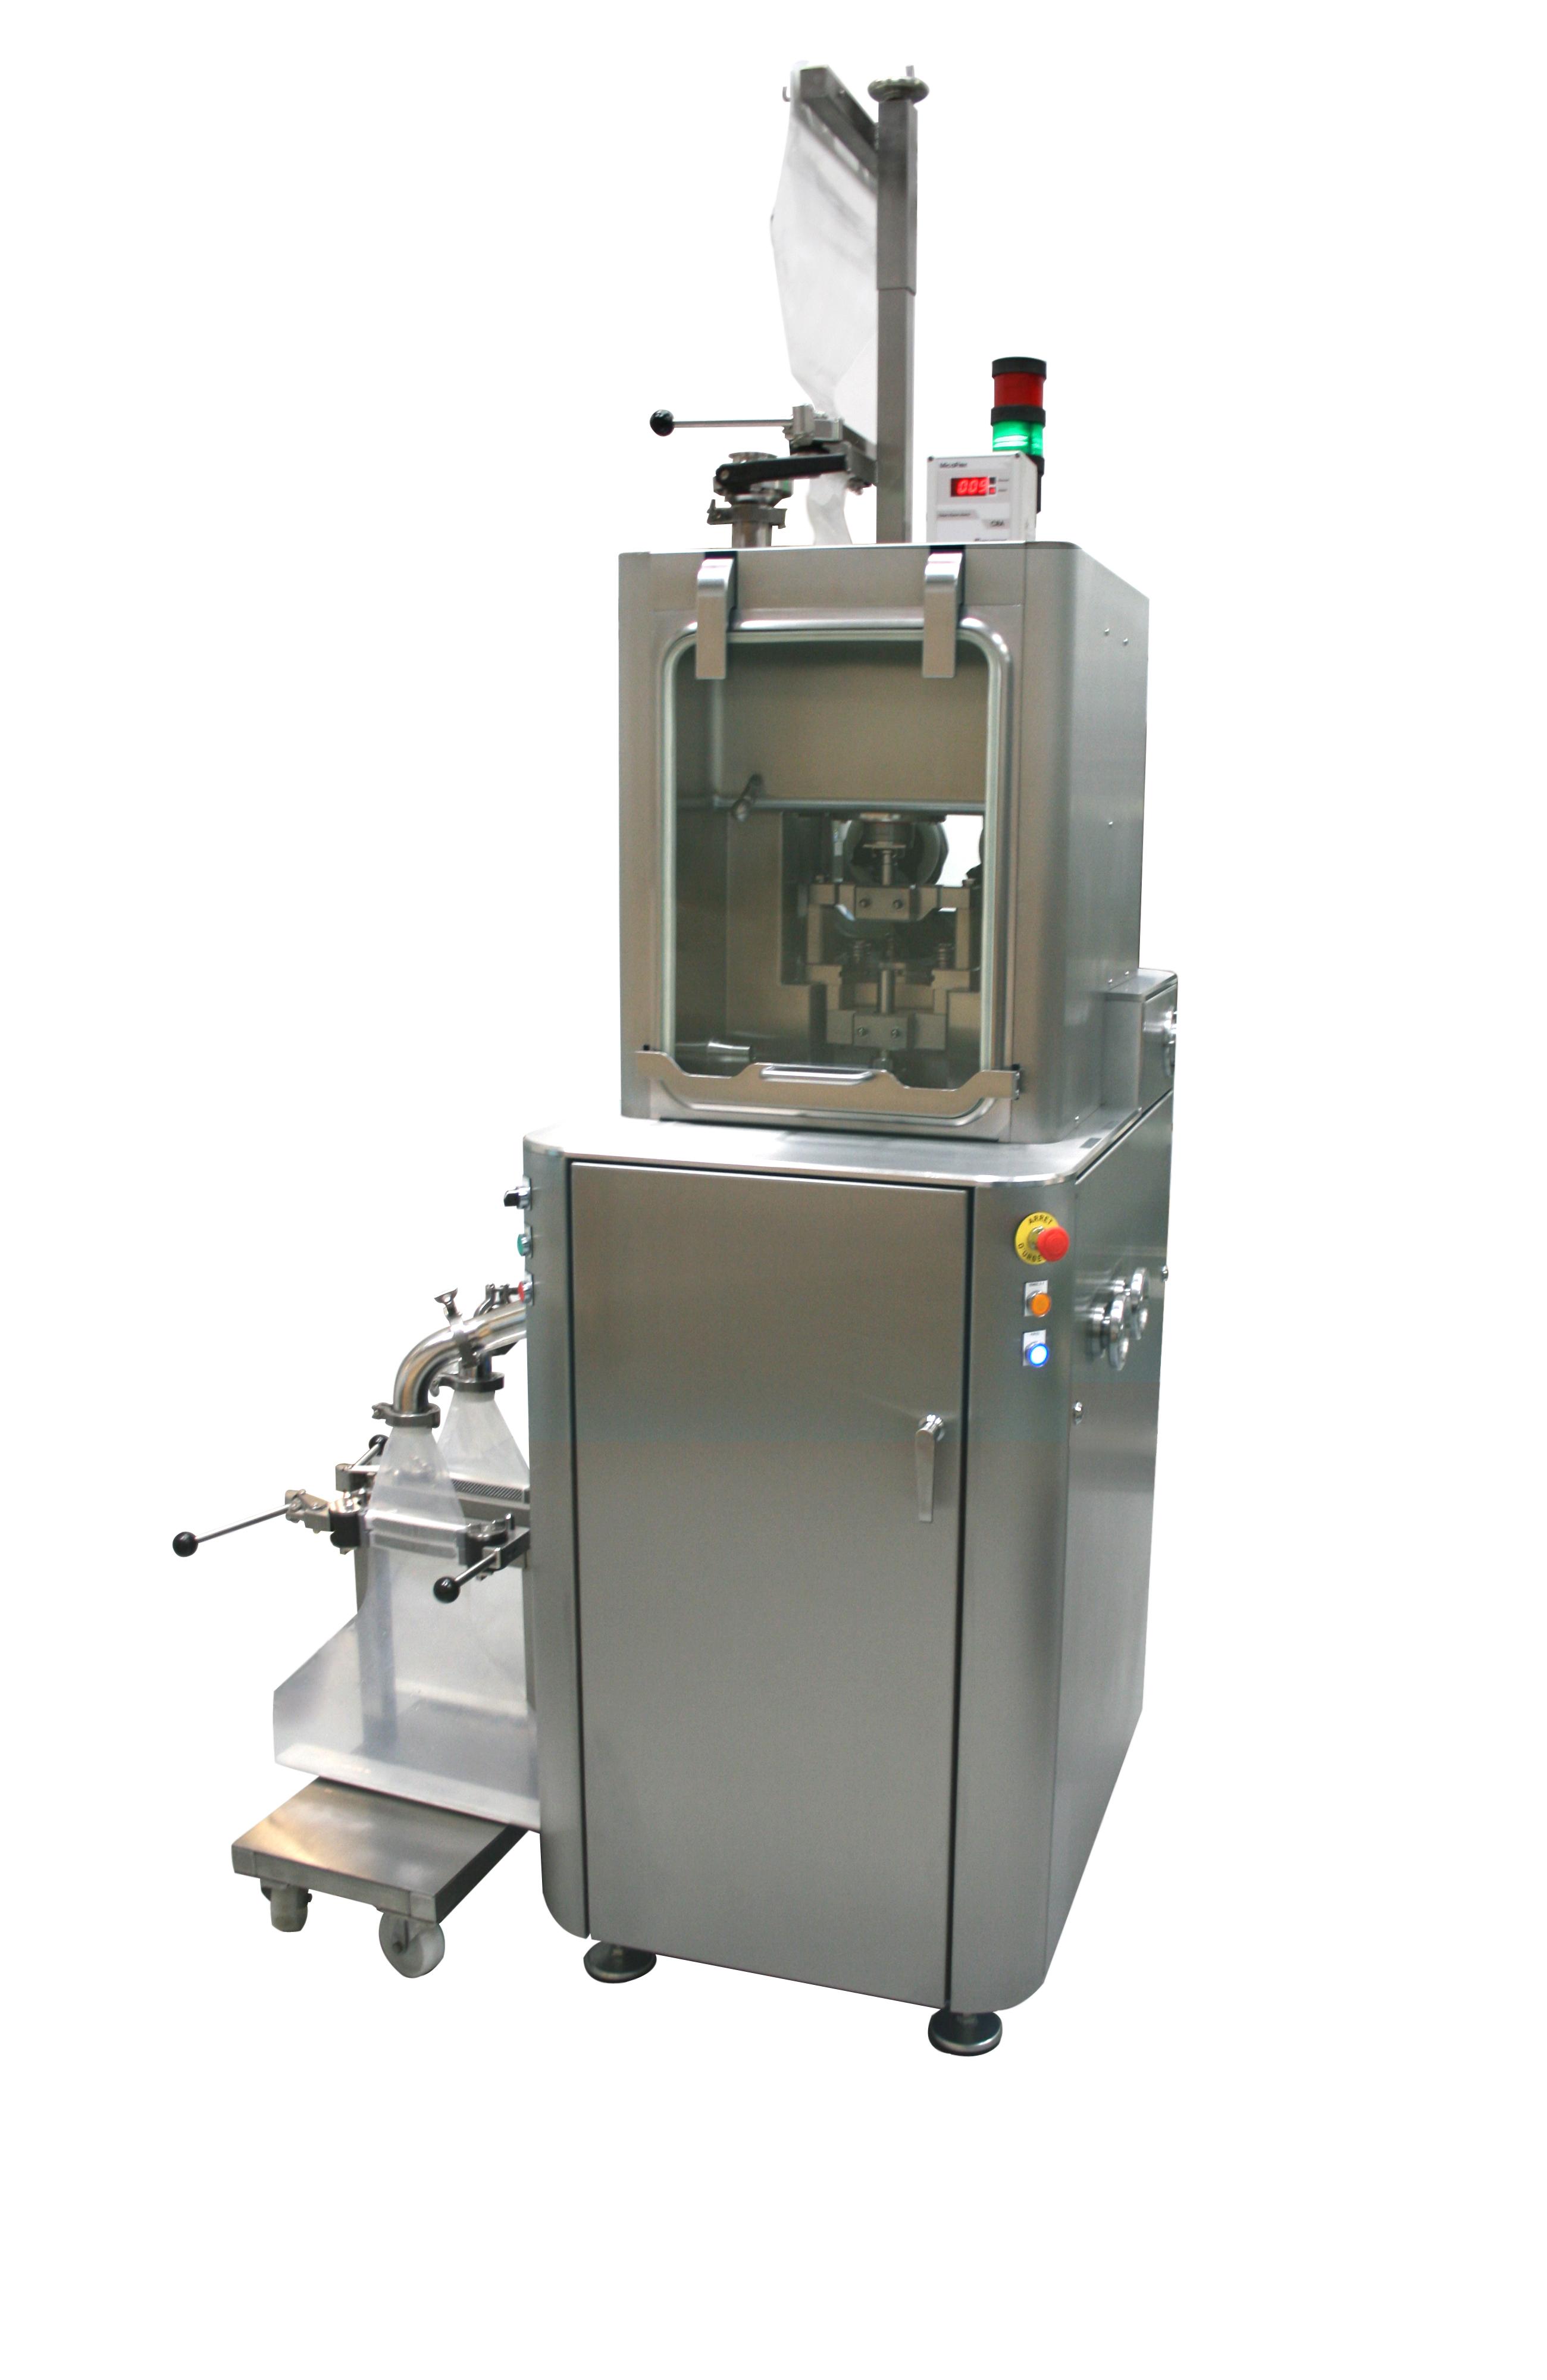 STYLCAM 200 Series – Rotary Press Simulator